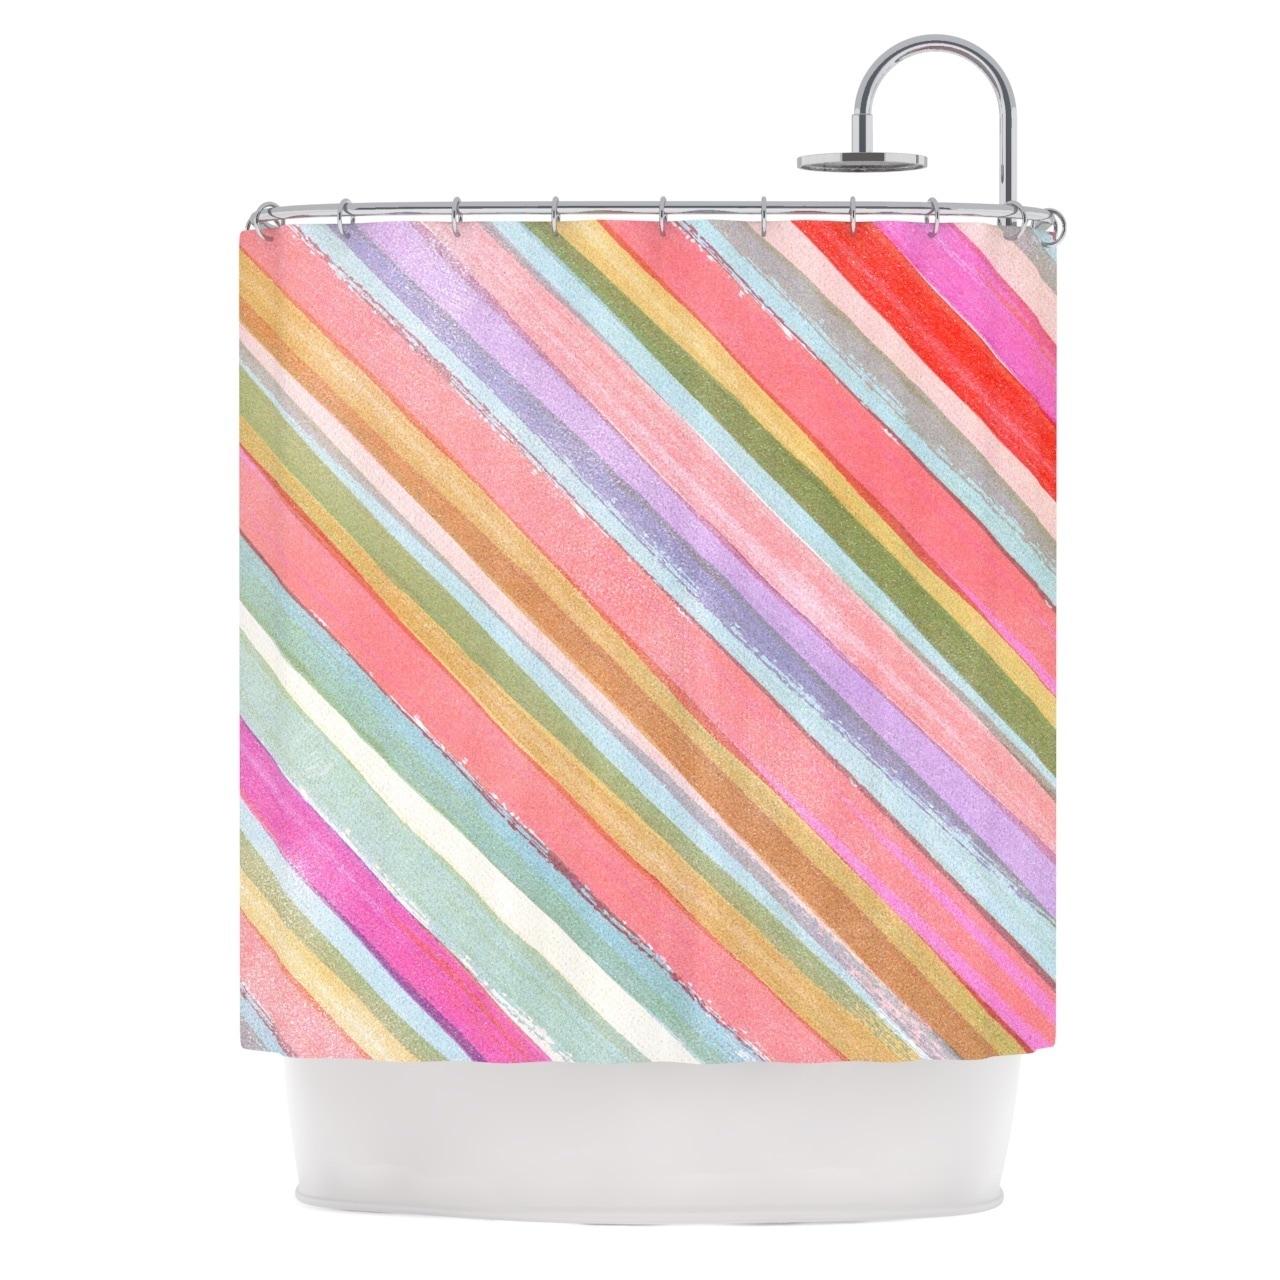 Kess Inhouse Heidi Jennings Pastel Stripes Pink Multicolor Shower Curtain 69x70 Multi 69 X 70